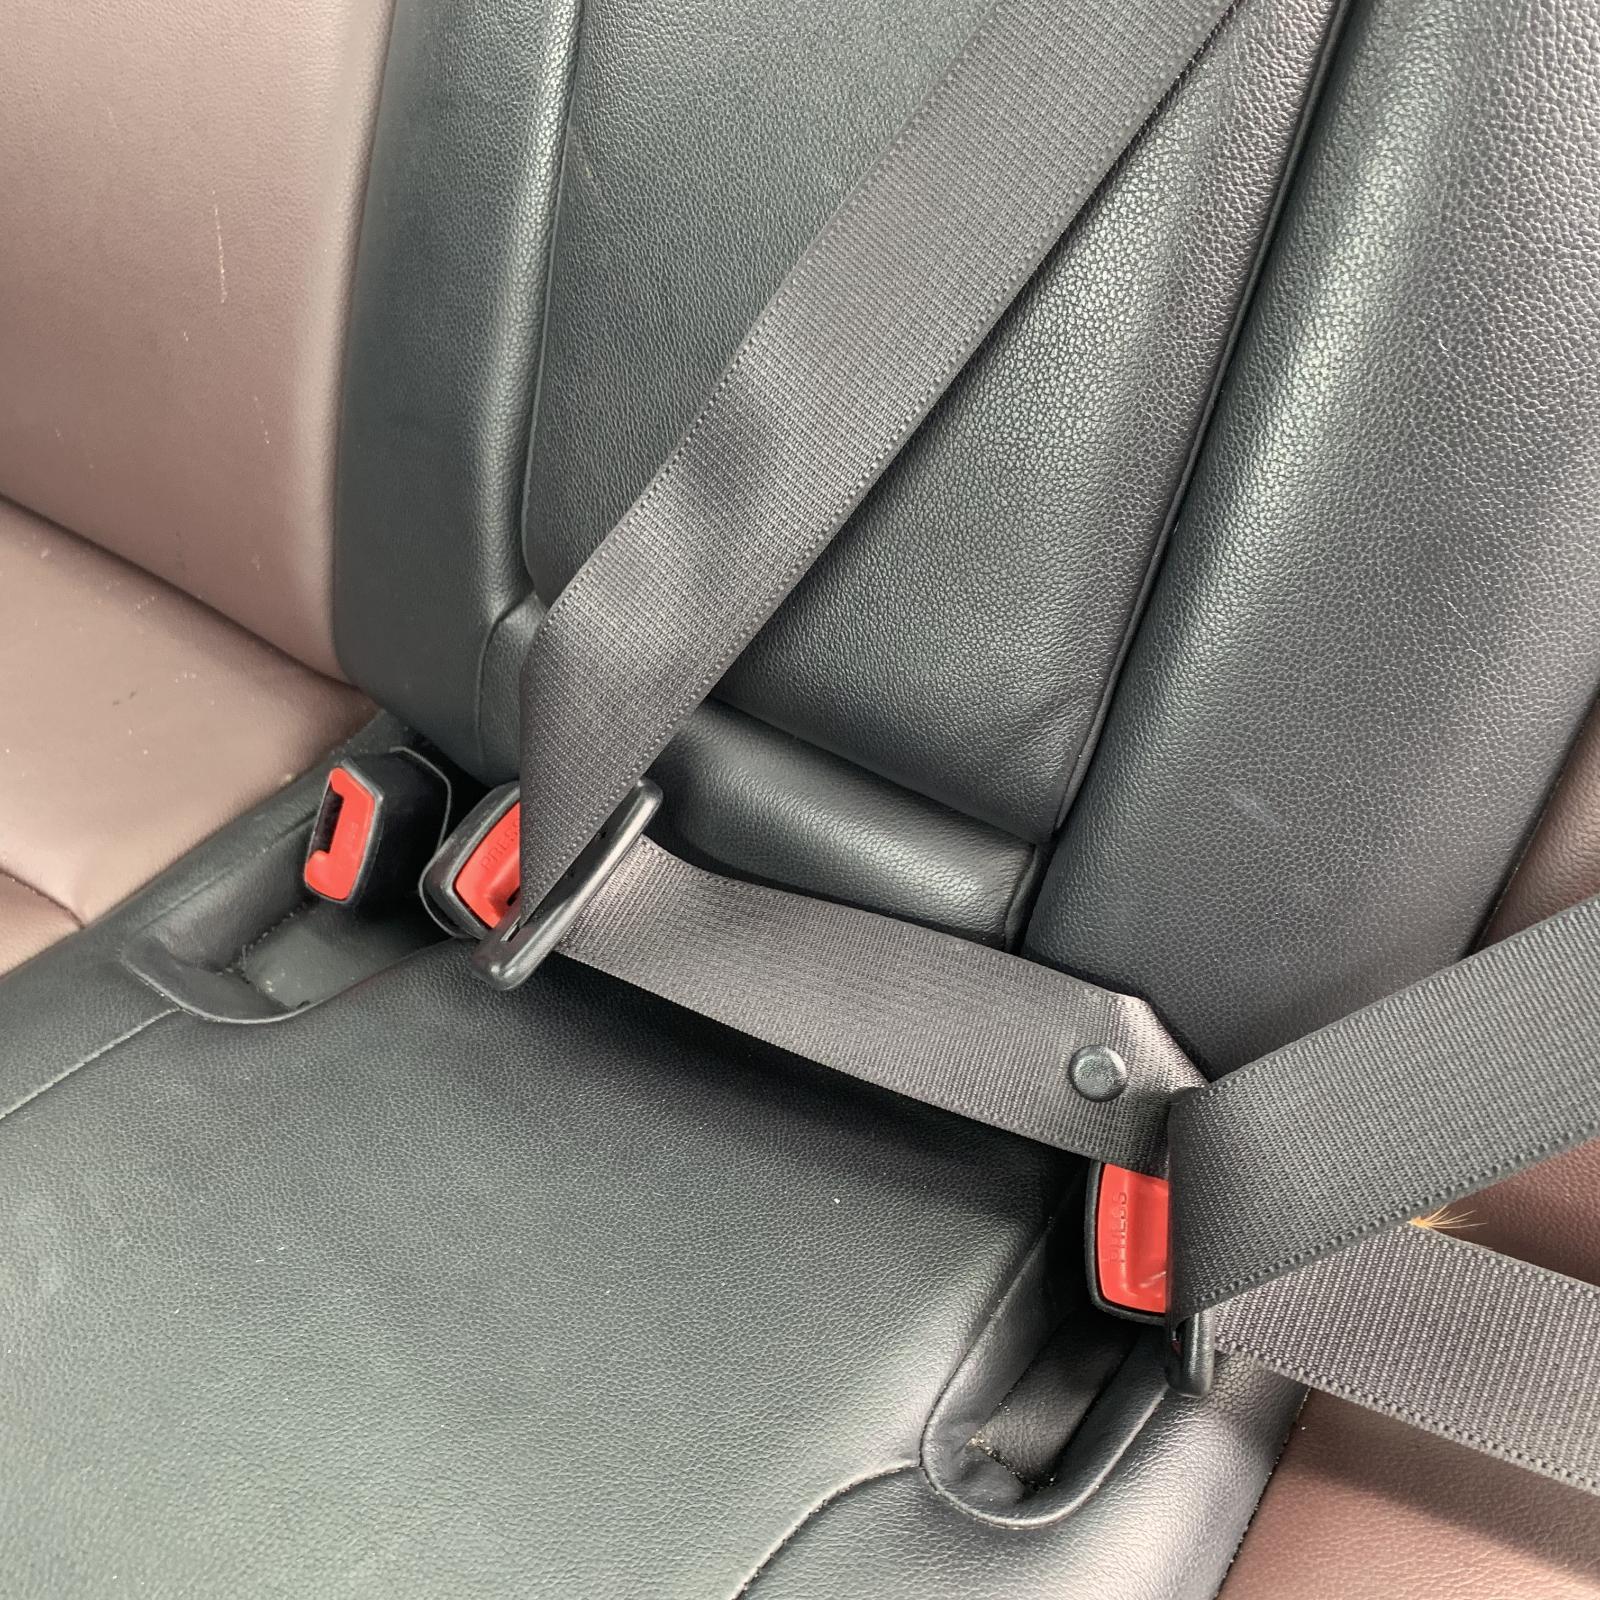 TOYOTA AURION, Seatbelt/Stalk, CENTRE REAR, SEAT BELT STALK ONLY, GSV50R, 02/12-08/17